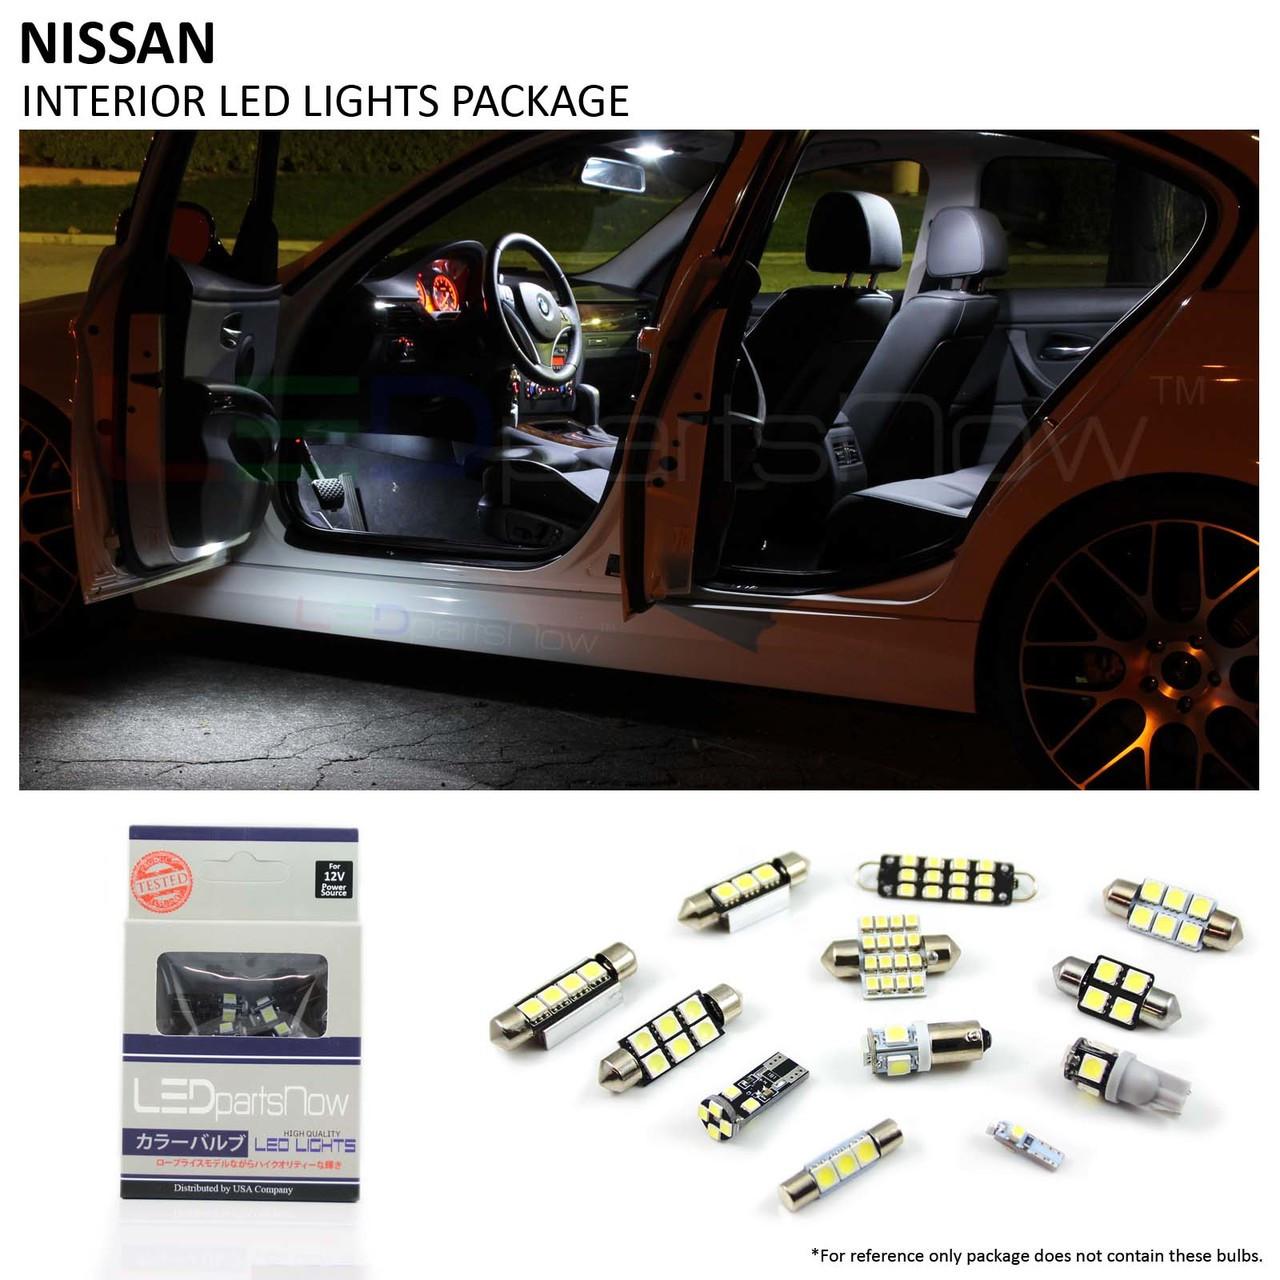 2012 nissan versa tail light bulb